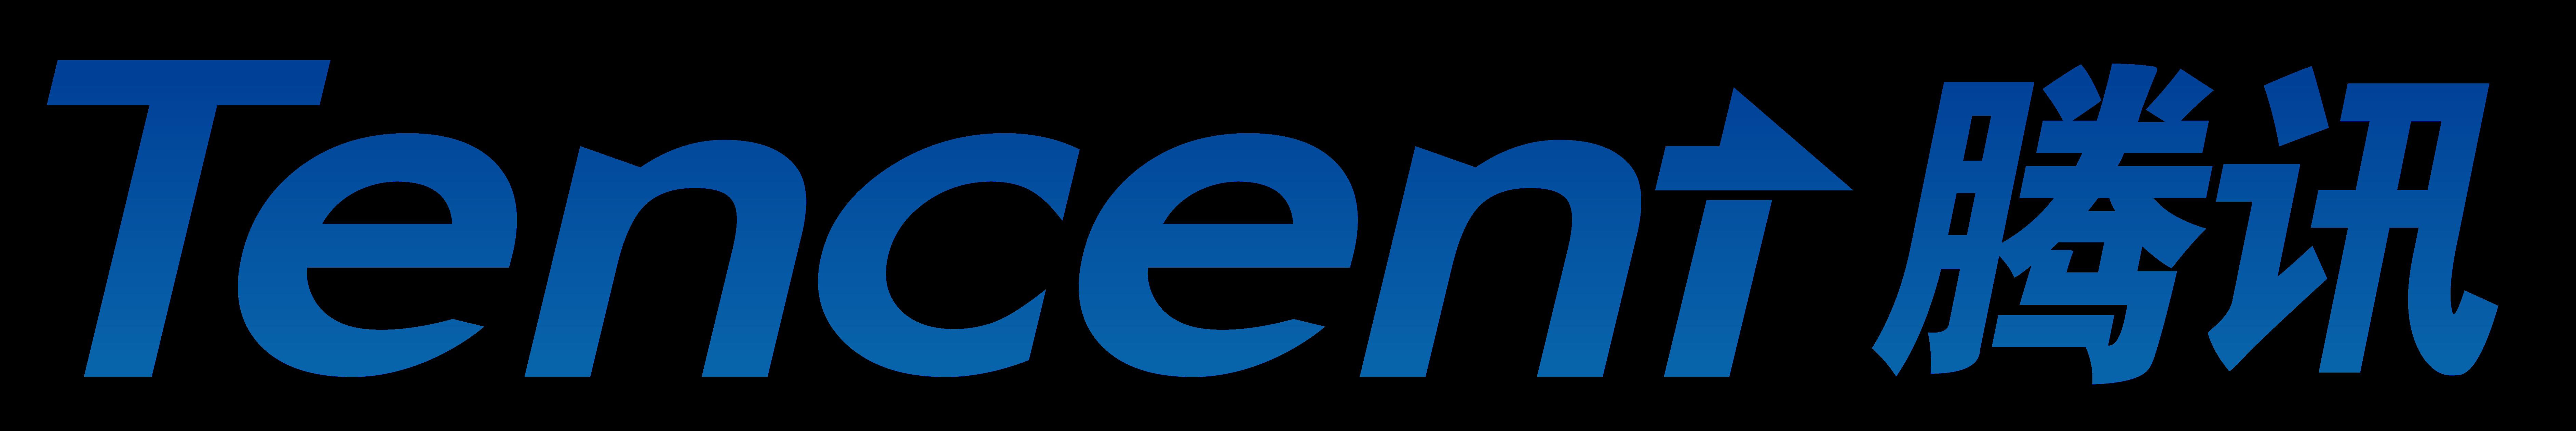 Tencent logo, logotype, emblem 2 - Tencent Logo PNG